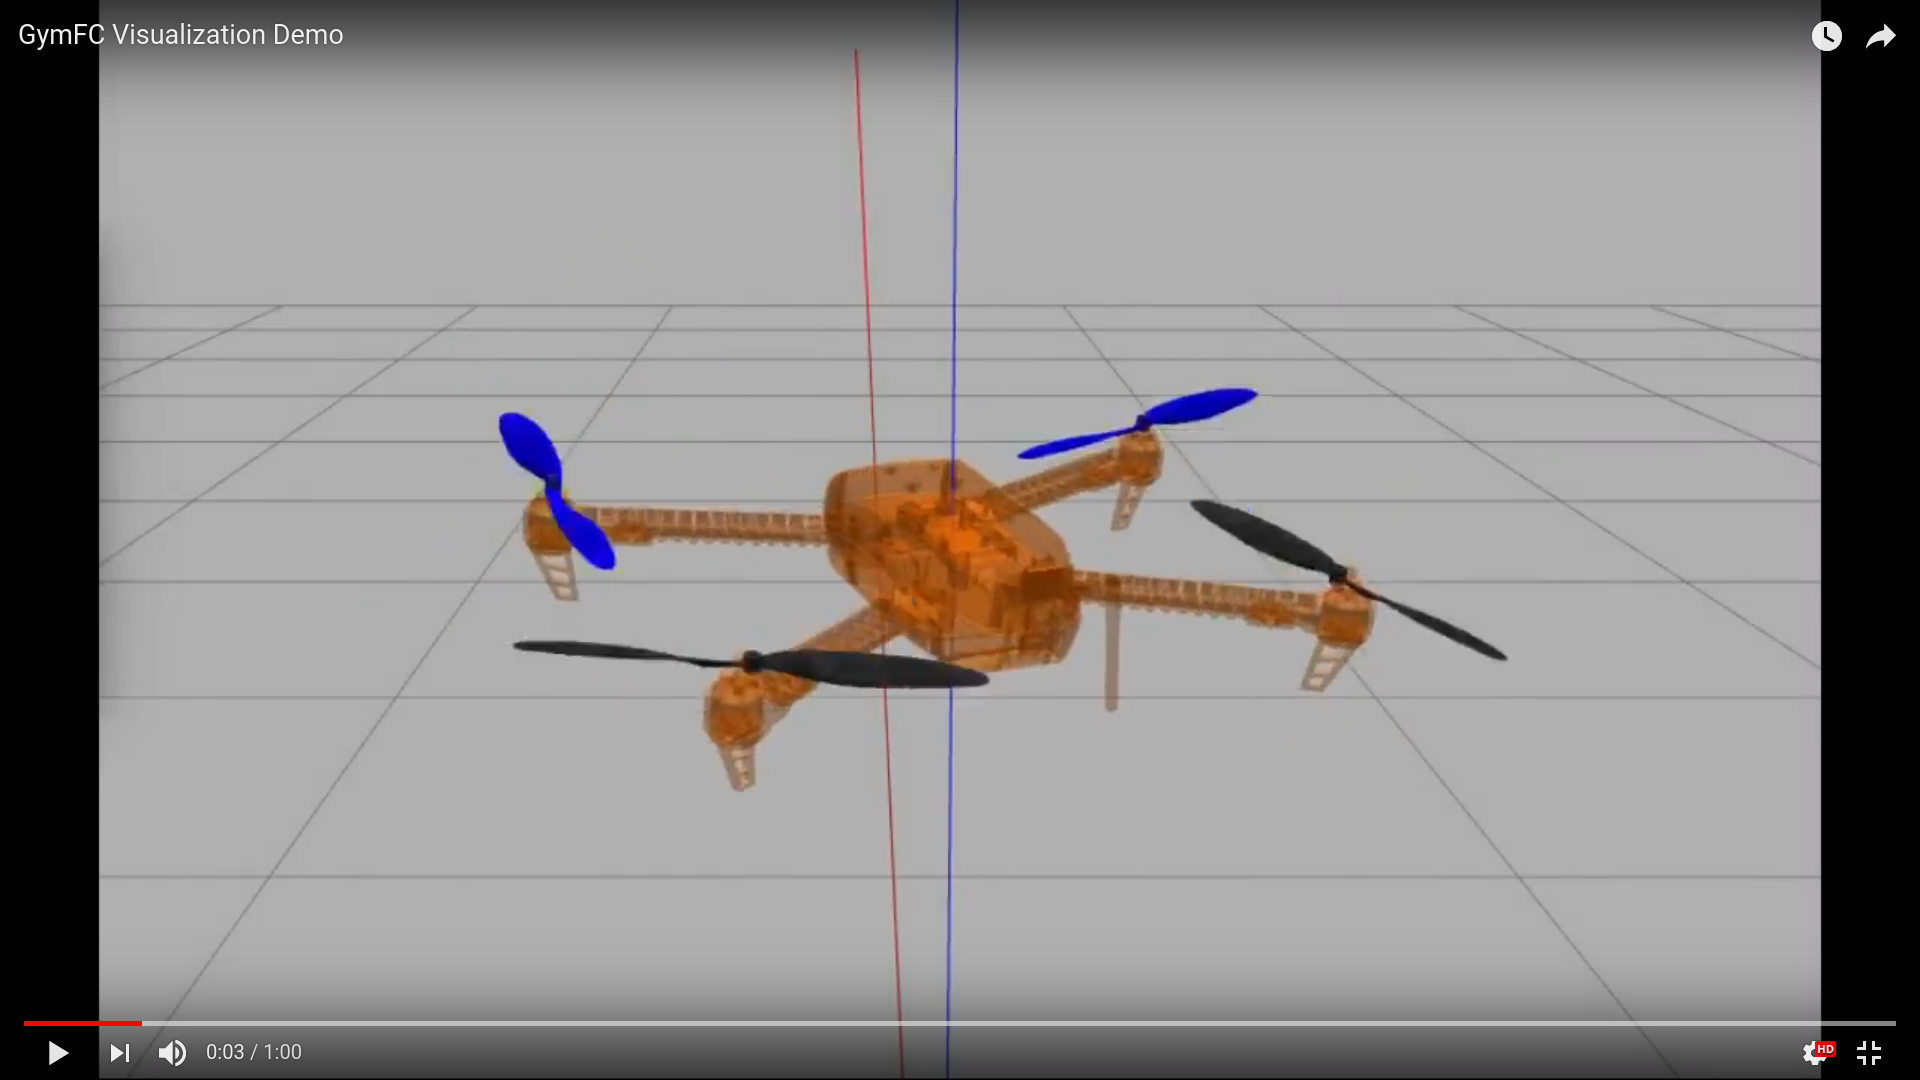 GymFC Visualization Demo